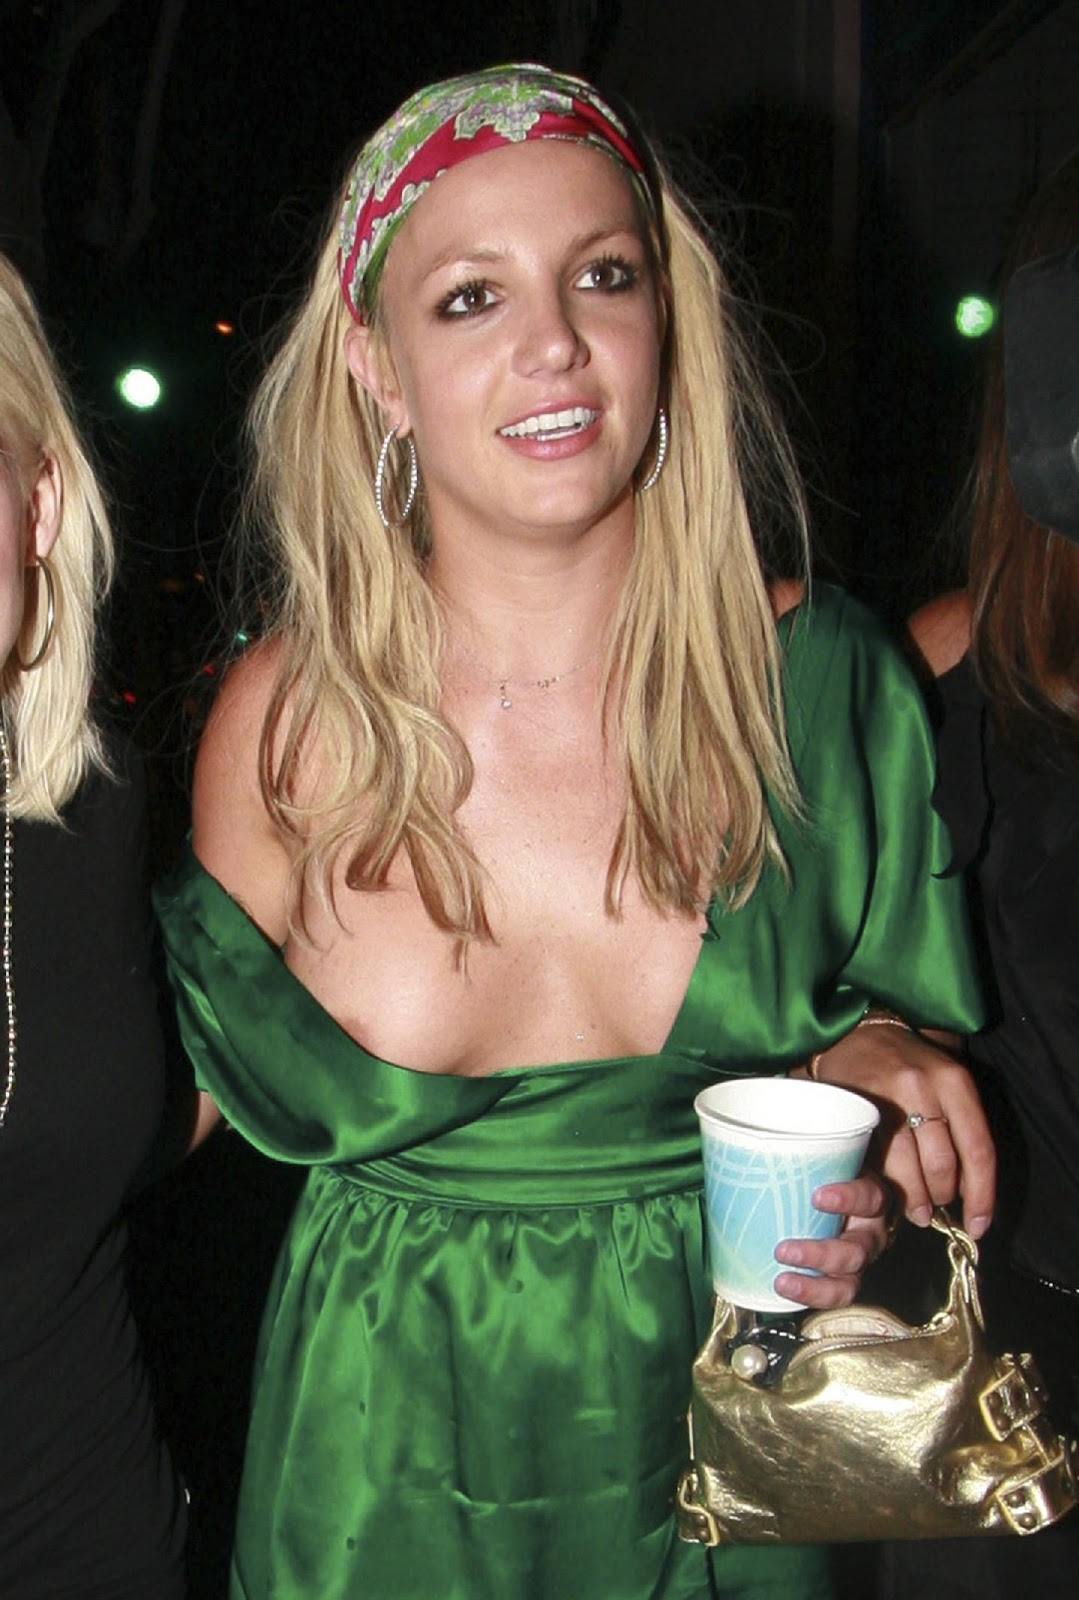 http://2.bp.blogspot.com/-P7nW6FIhyB8/TzTlXgghq2I/AAAAAAAABFM/5hMbevqoU0E/s1600/britney+spears+sexy+dress.jpg